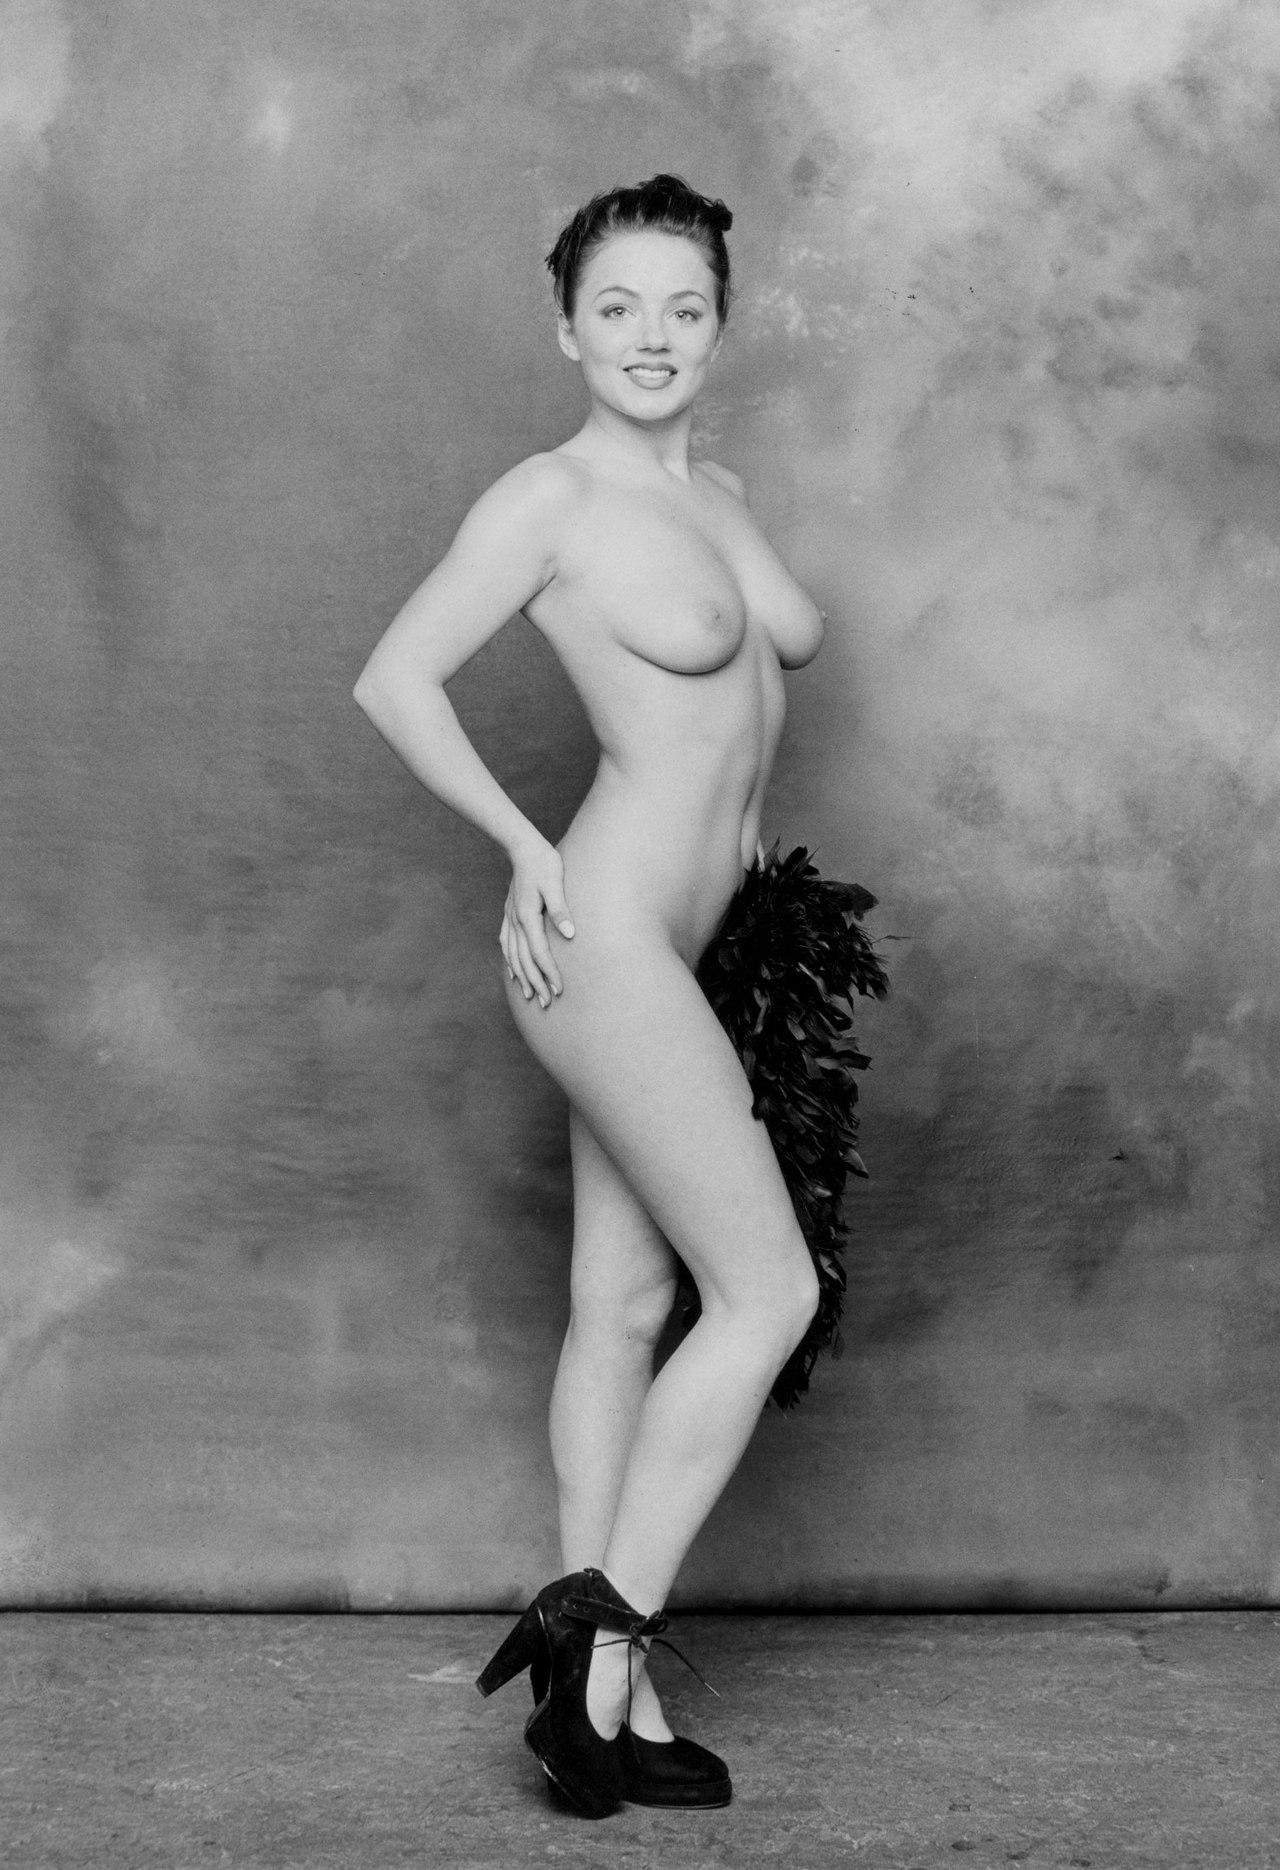 Jeri haliwell nude